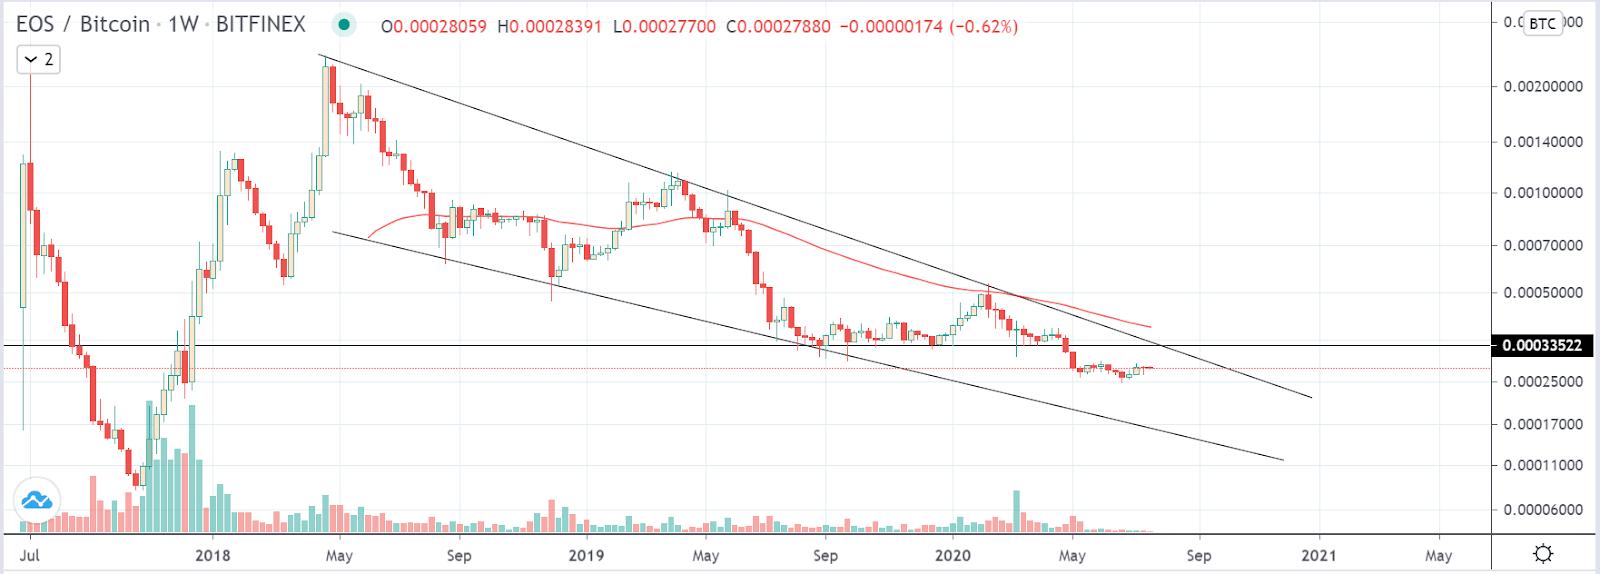 EOS/BTC Weekly Chart on Binance (TradingView)